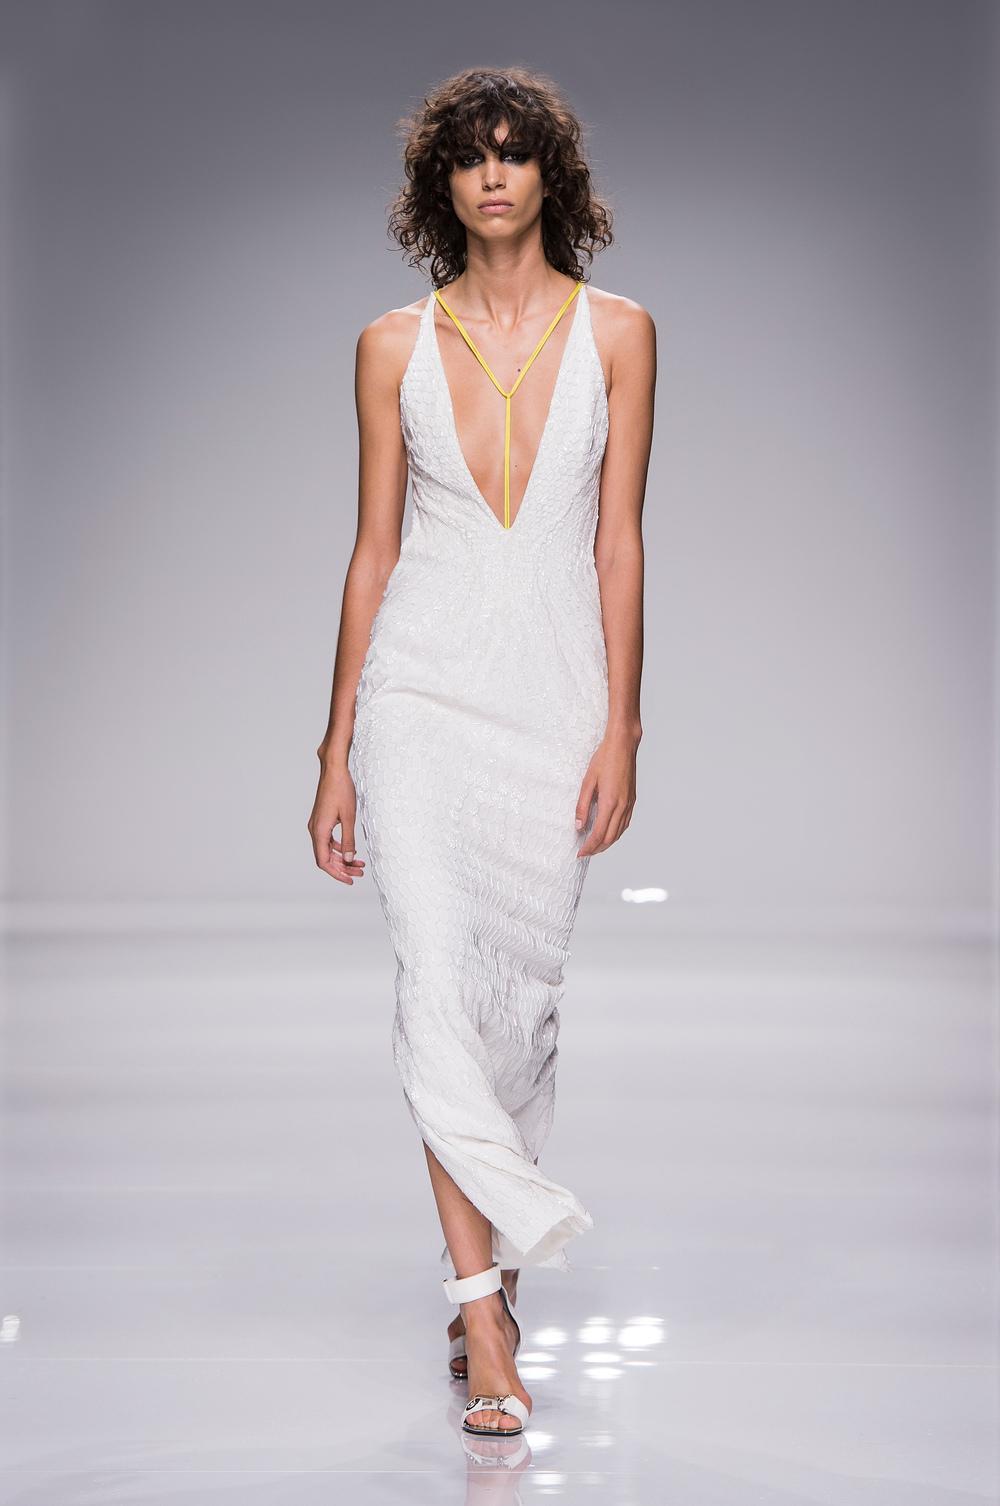 Atelier Versace SS16_Look 35.JPG